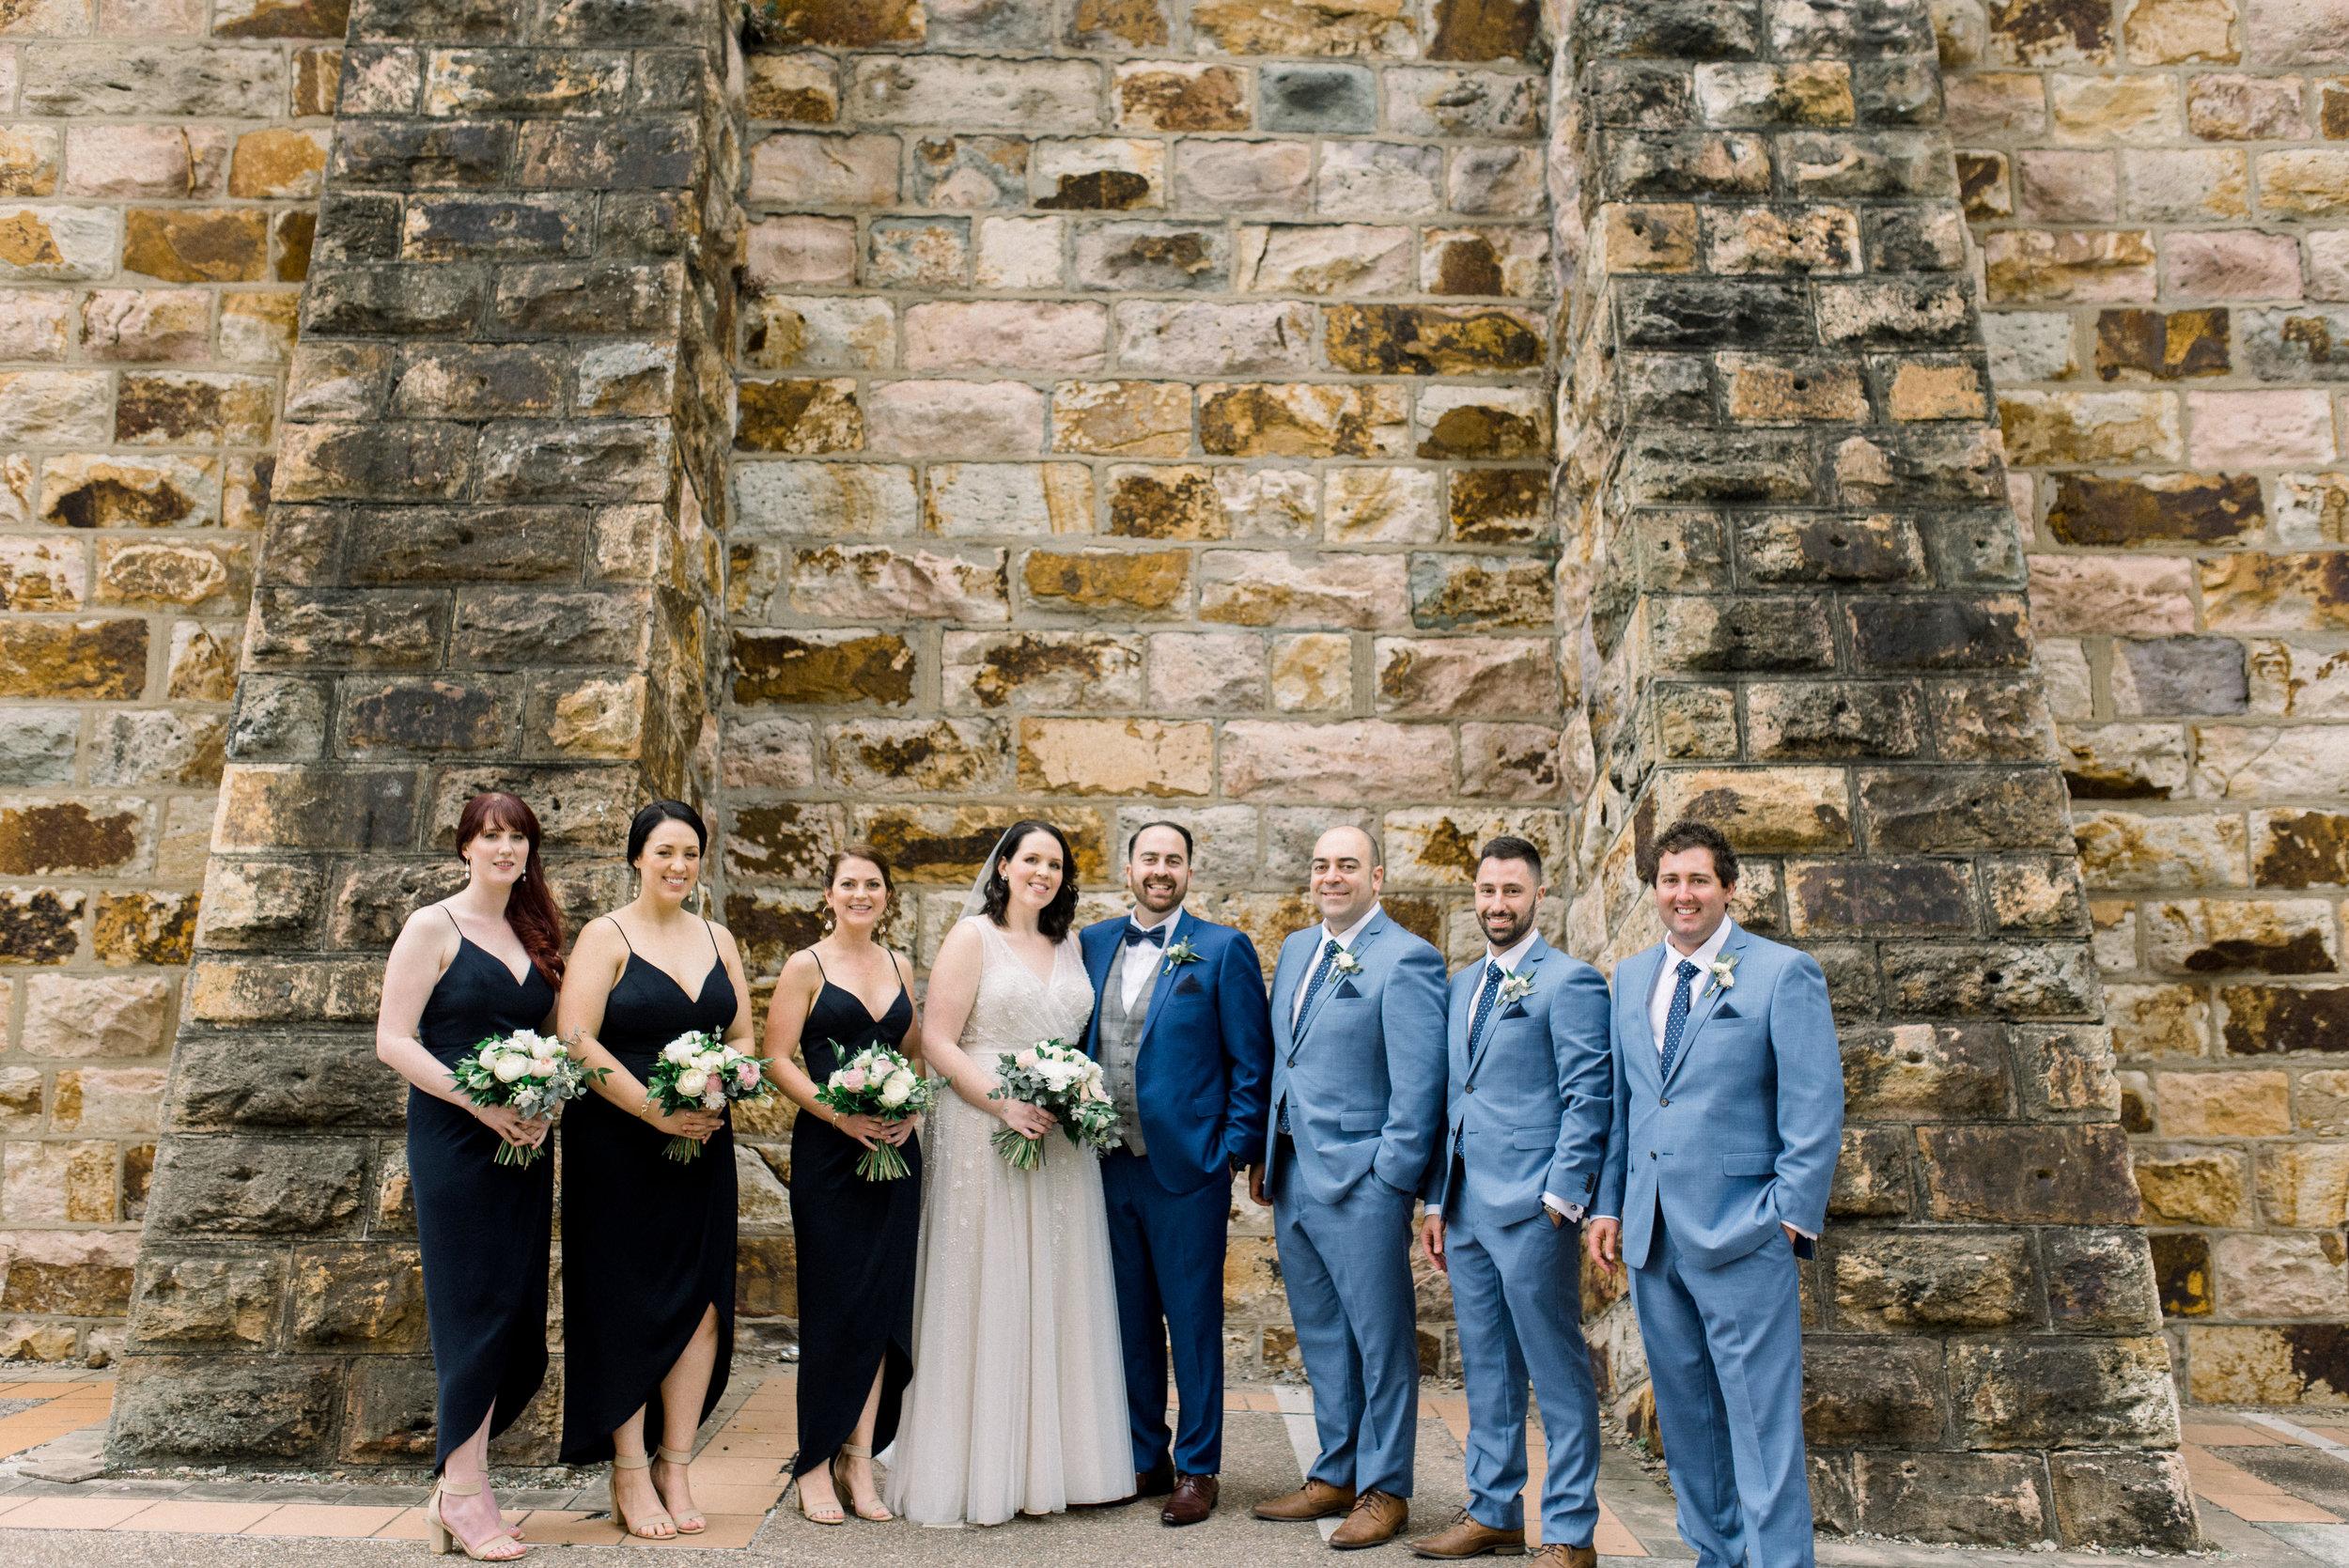 brisbane-city-wedding-photographer-romantic-wedding-52.jpg